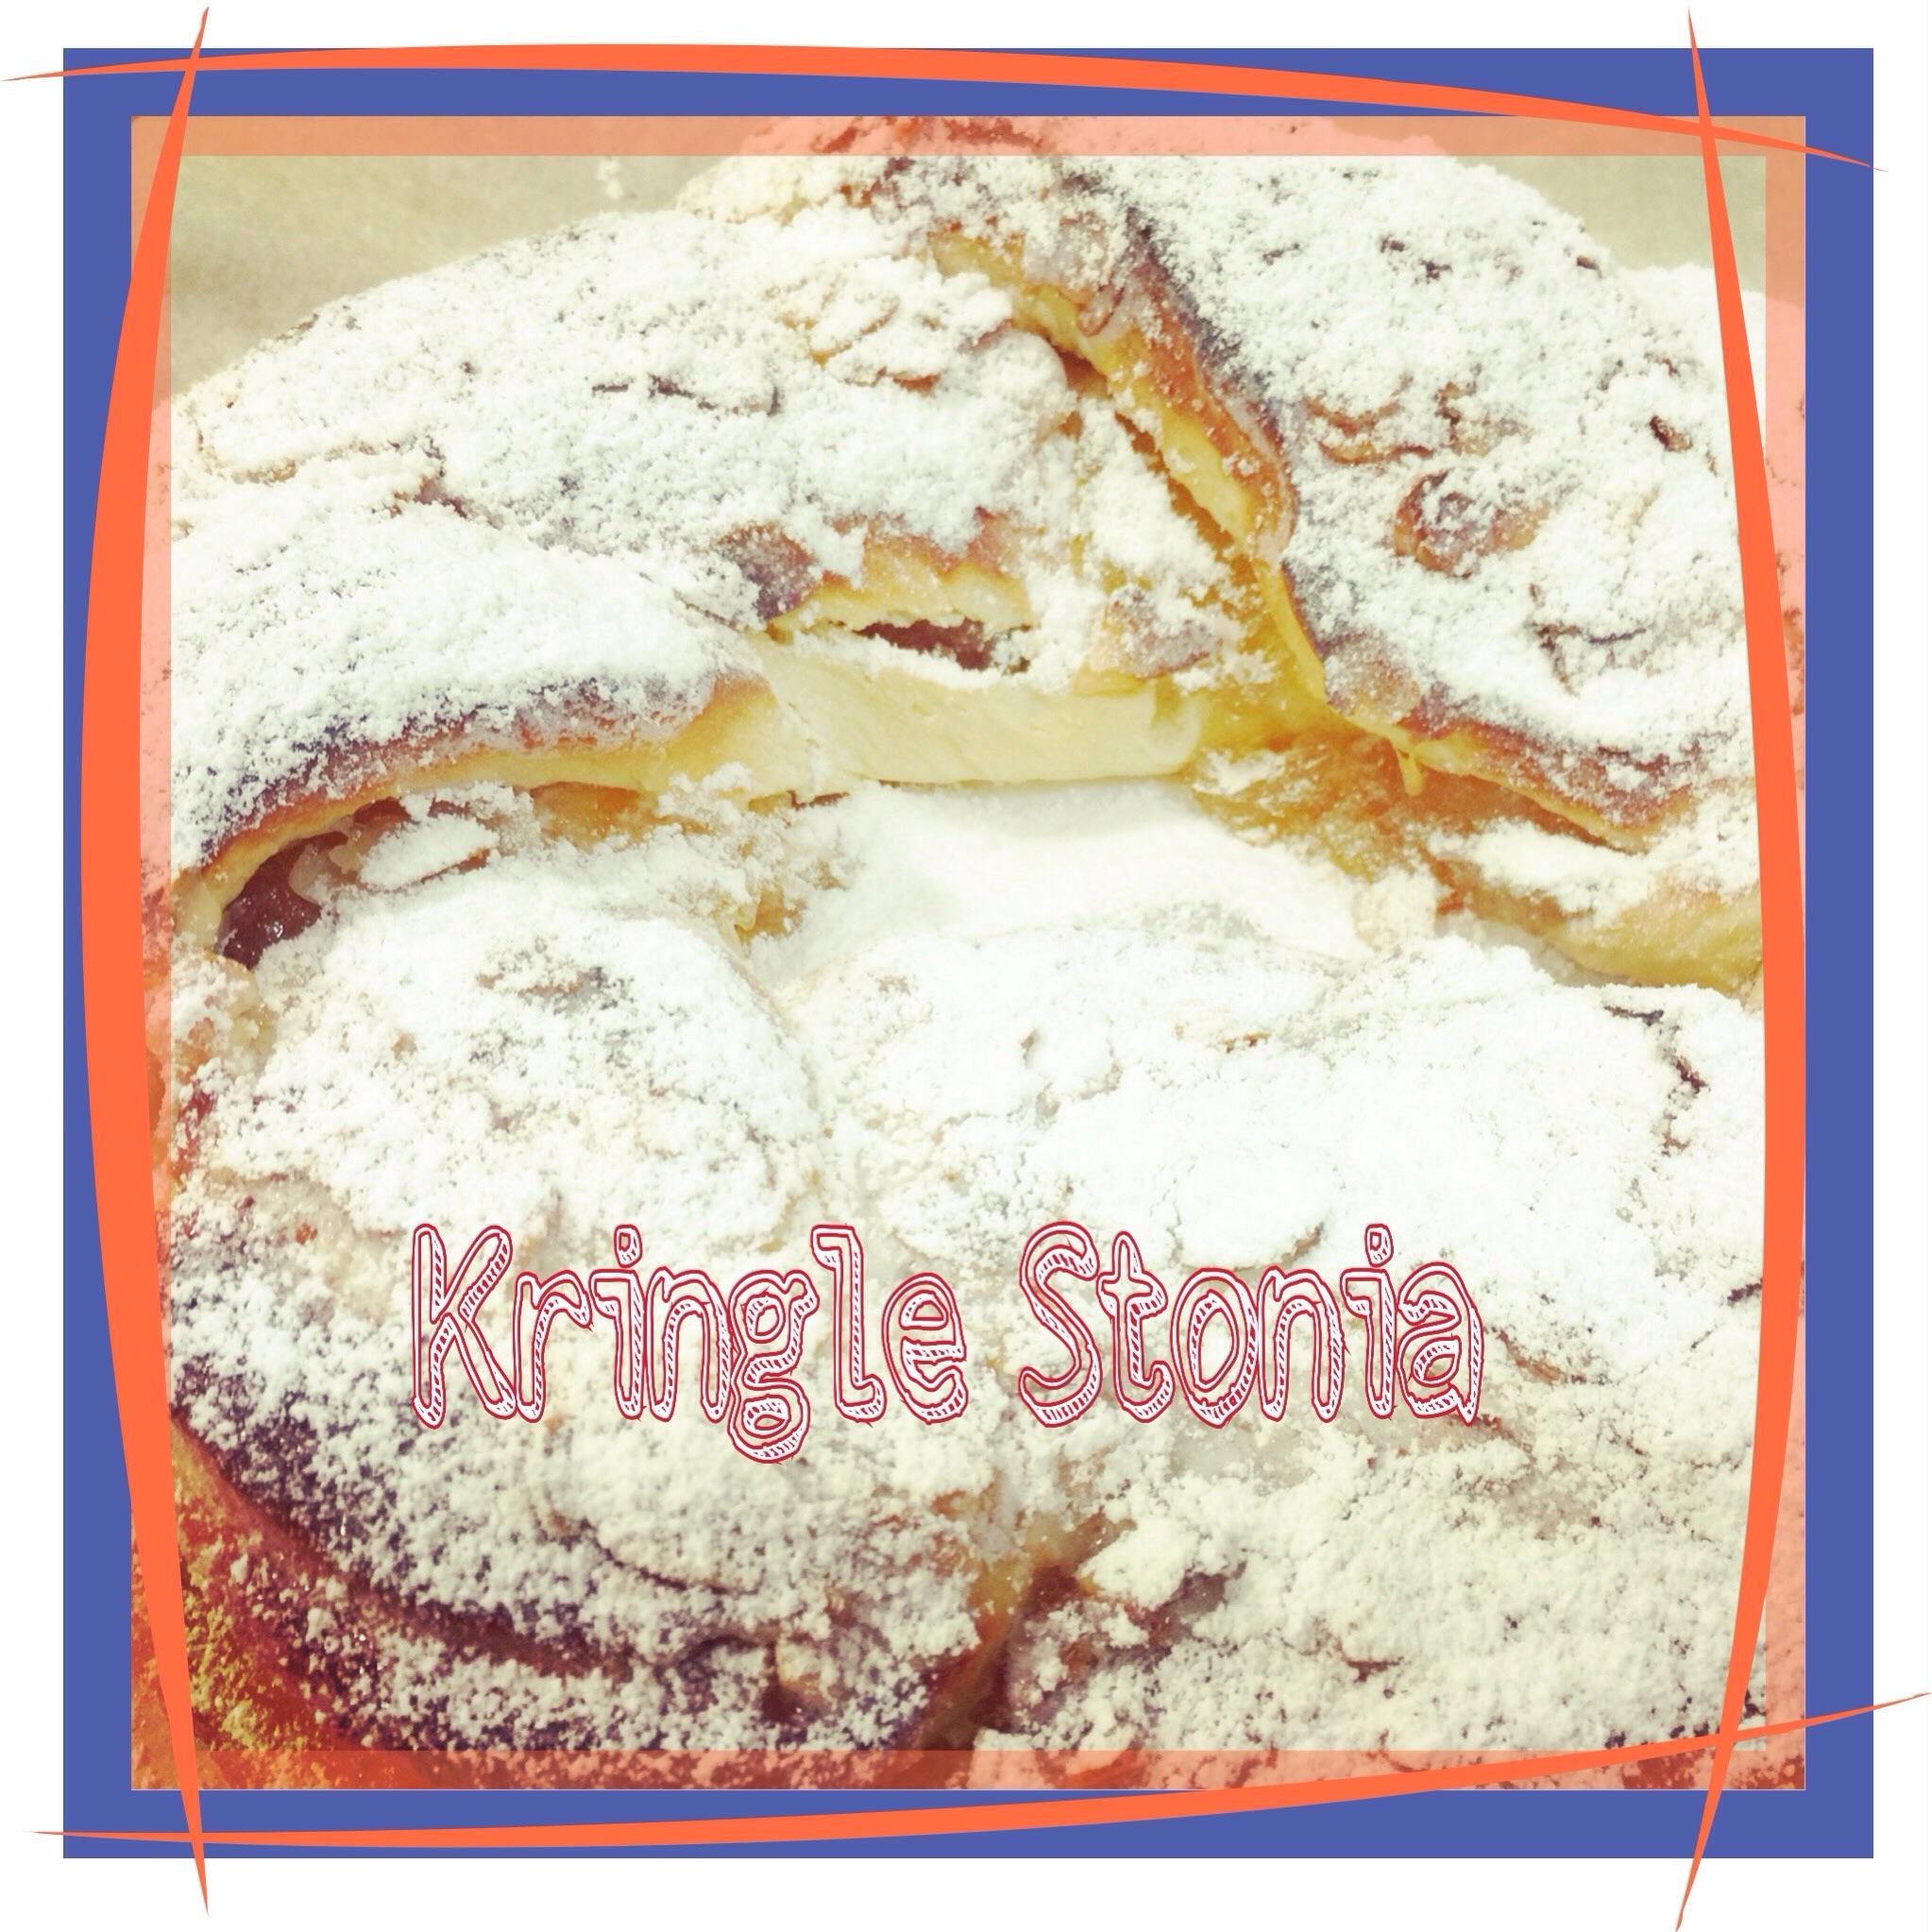 Kringle de Cabello de Ángel